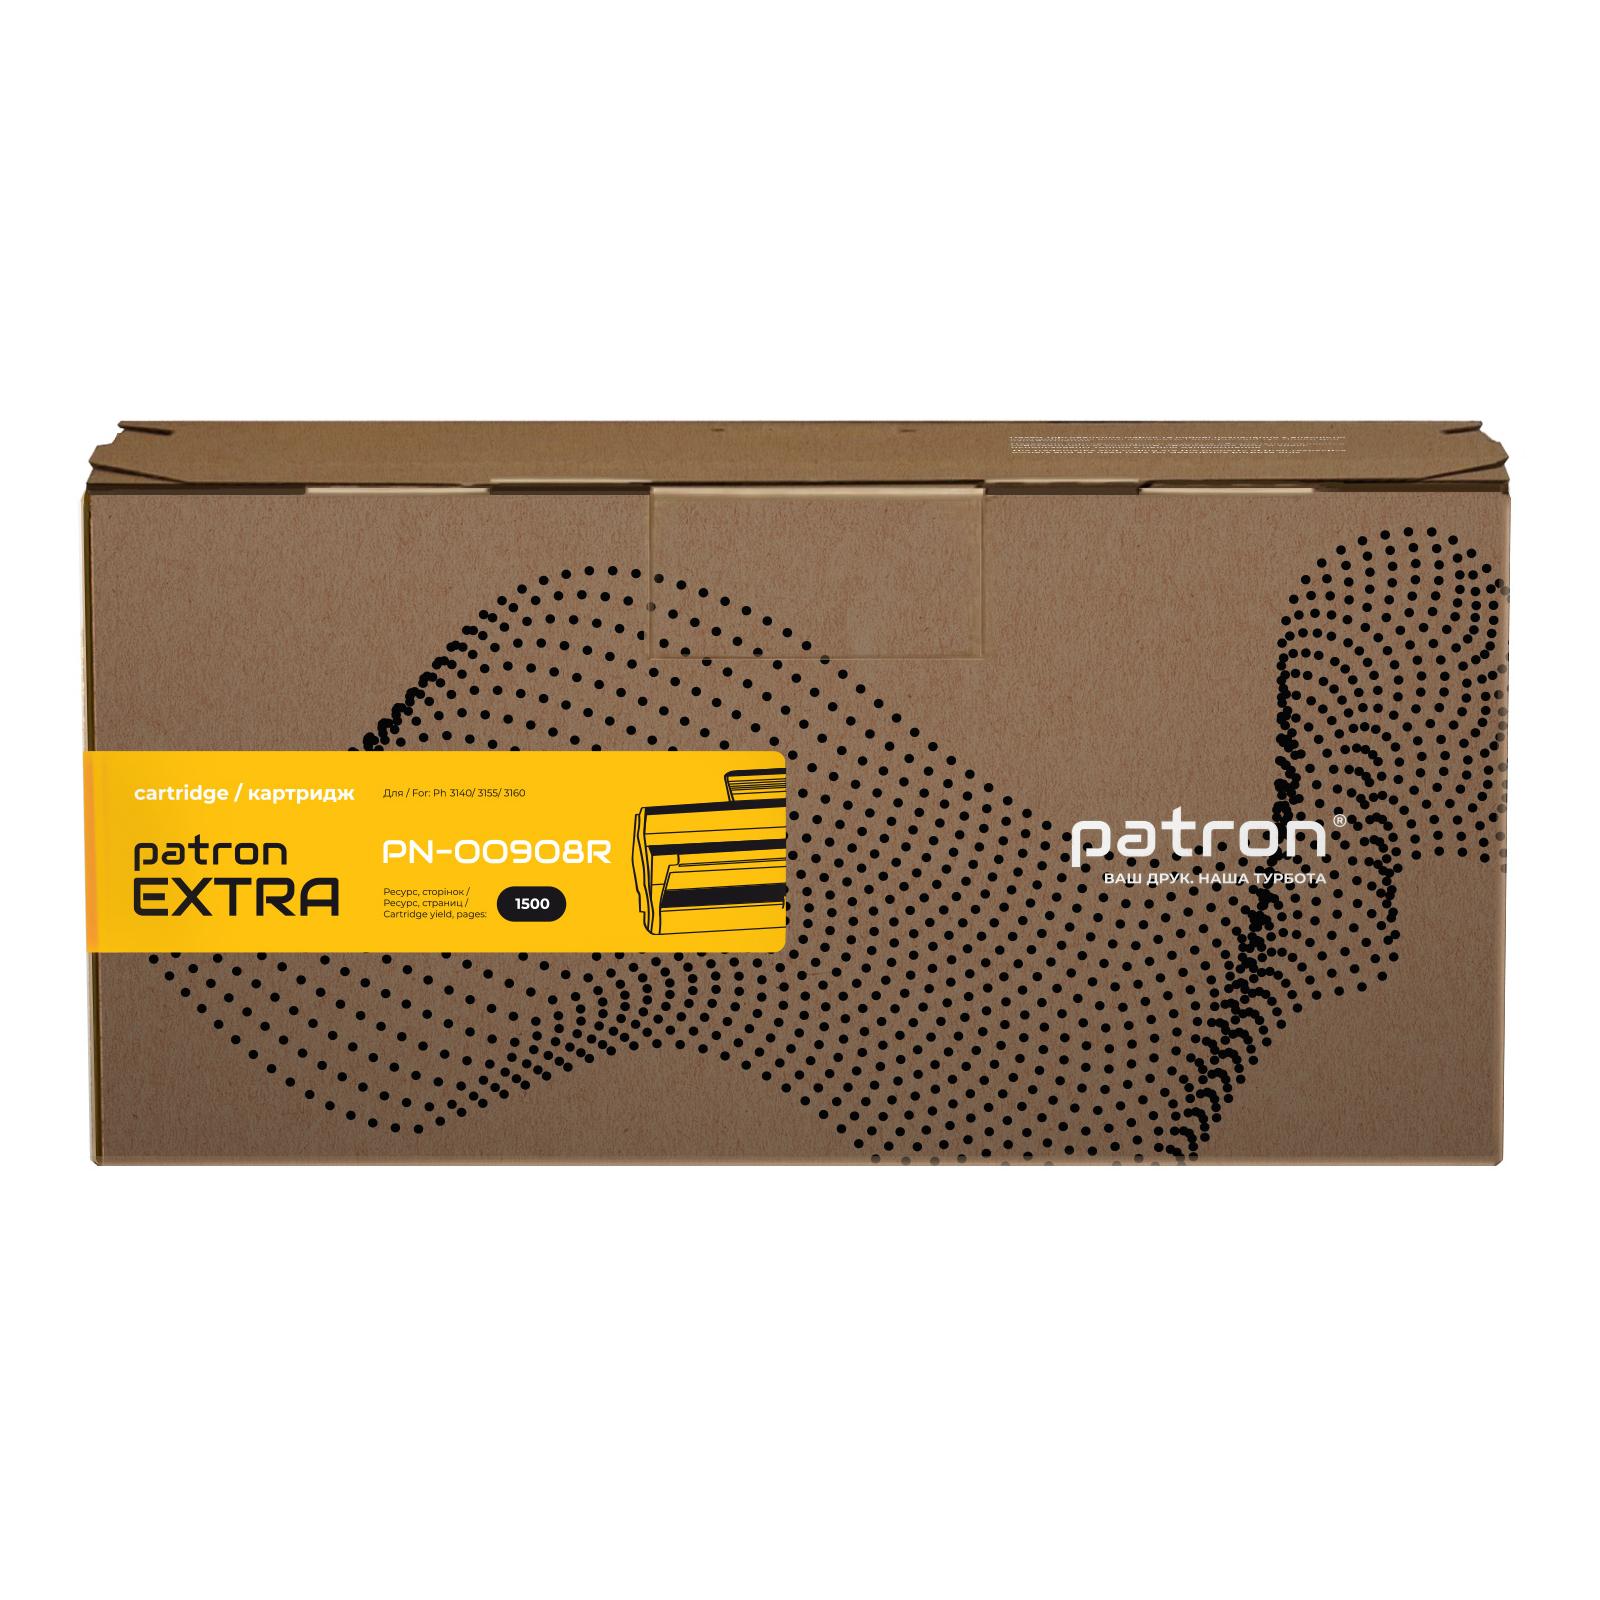 Картридж PATRON XEROX Ph 3140 (108R00908) Extra (PN-00908R) изображение 2